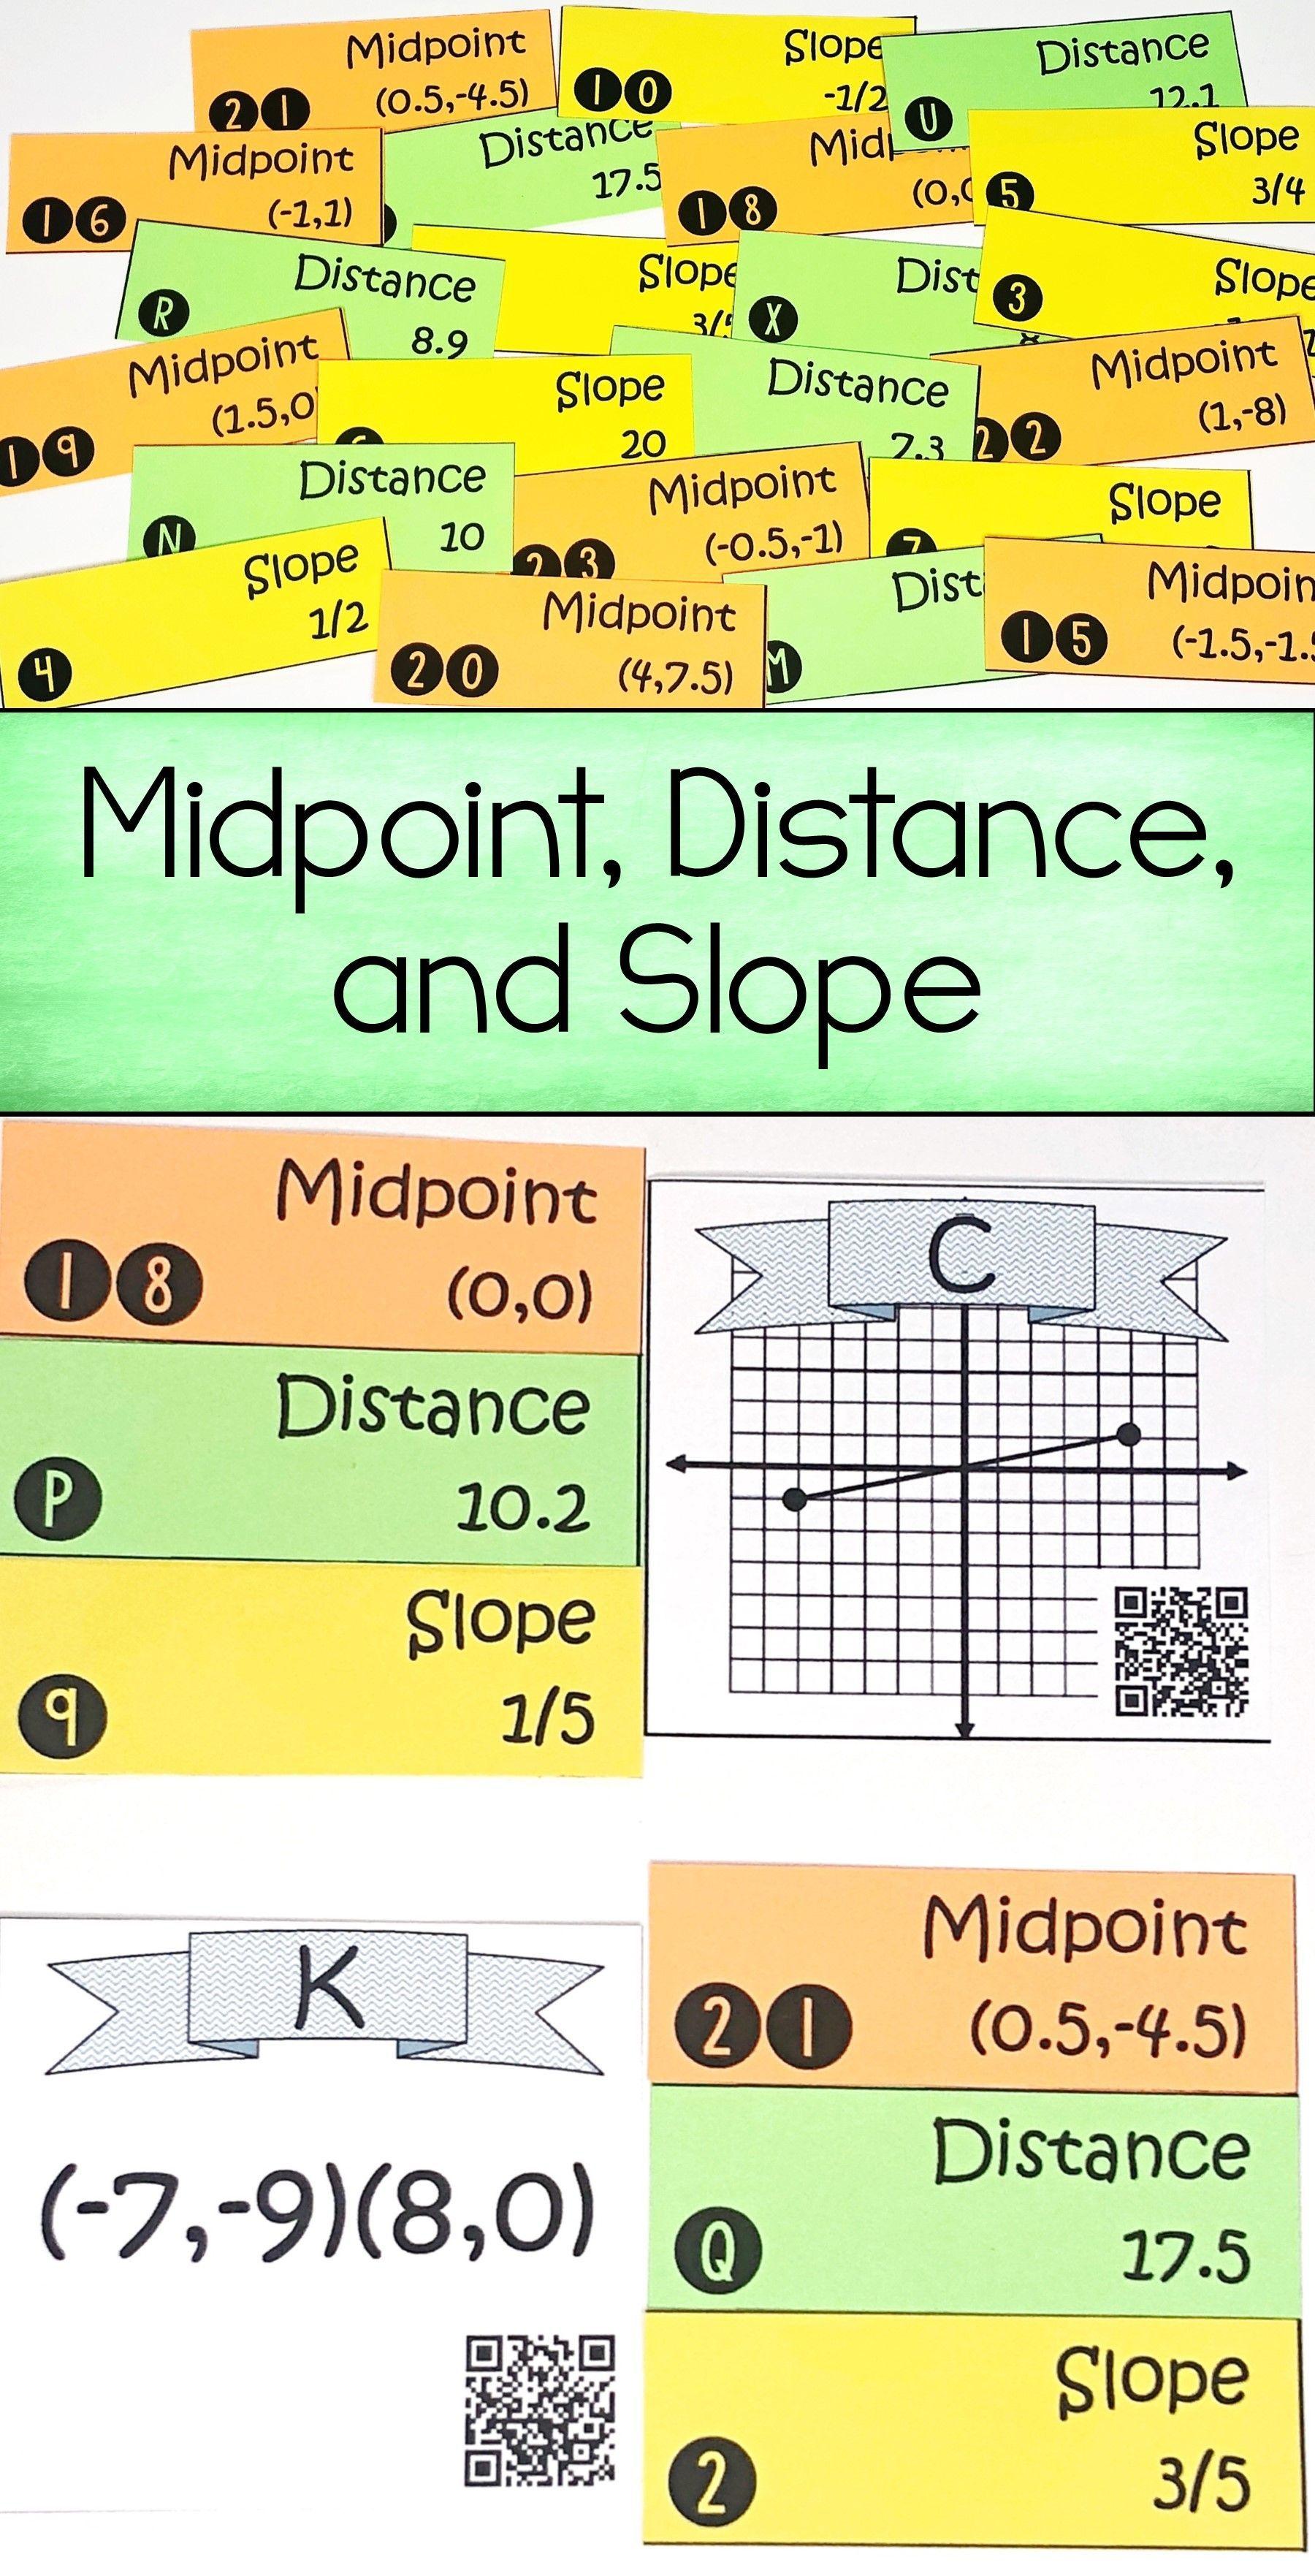 Midpoint Formula Distance Formula And Slope Formula Activity 8th Grade Math Teaching Geometry 8th Grade Math Worksheets